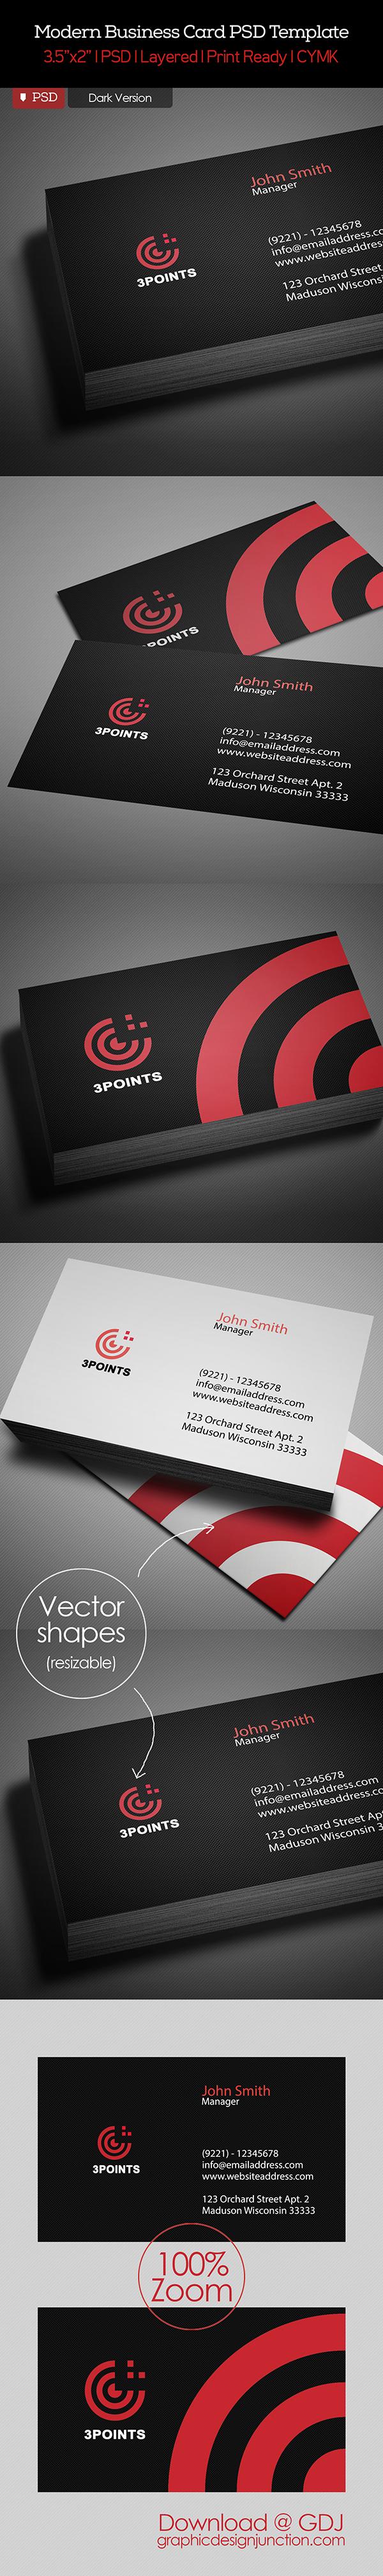 Free Business Card PSD Template Dark Version